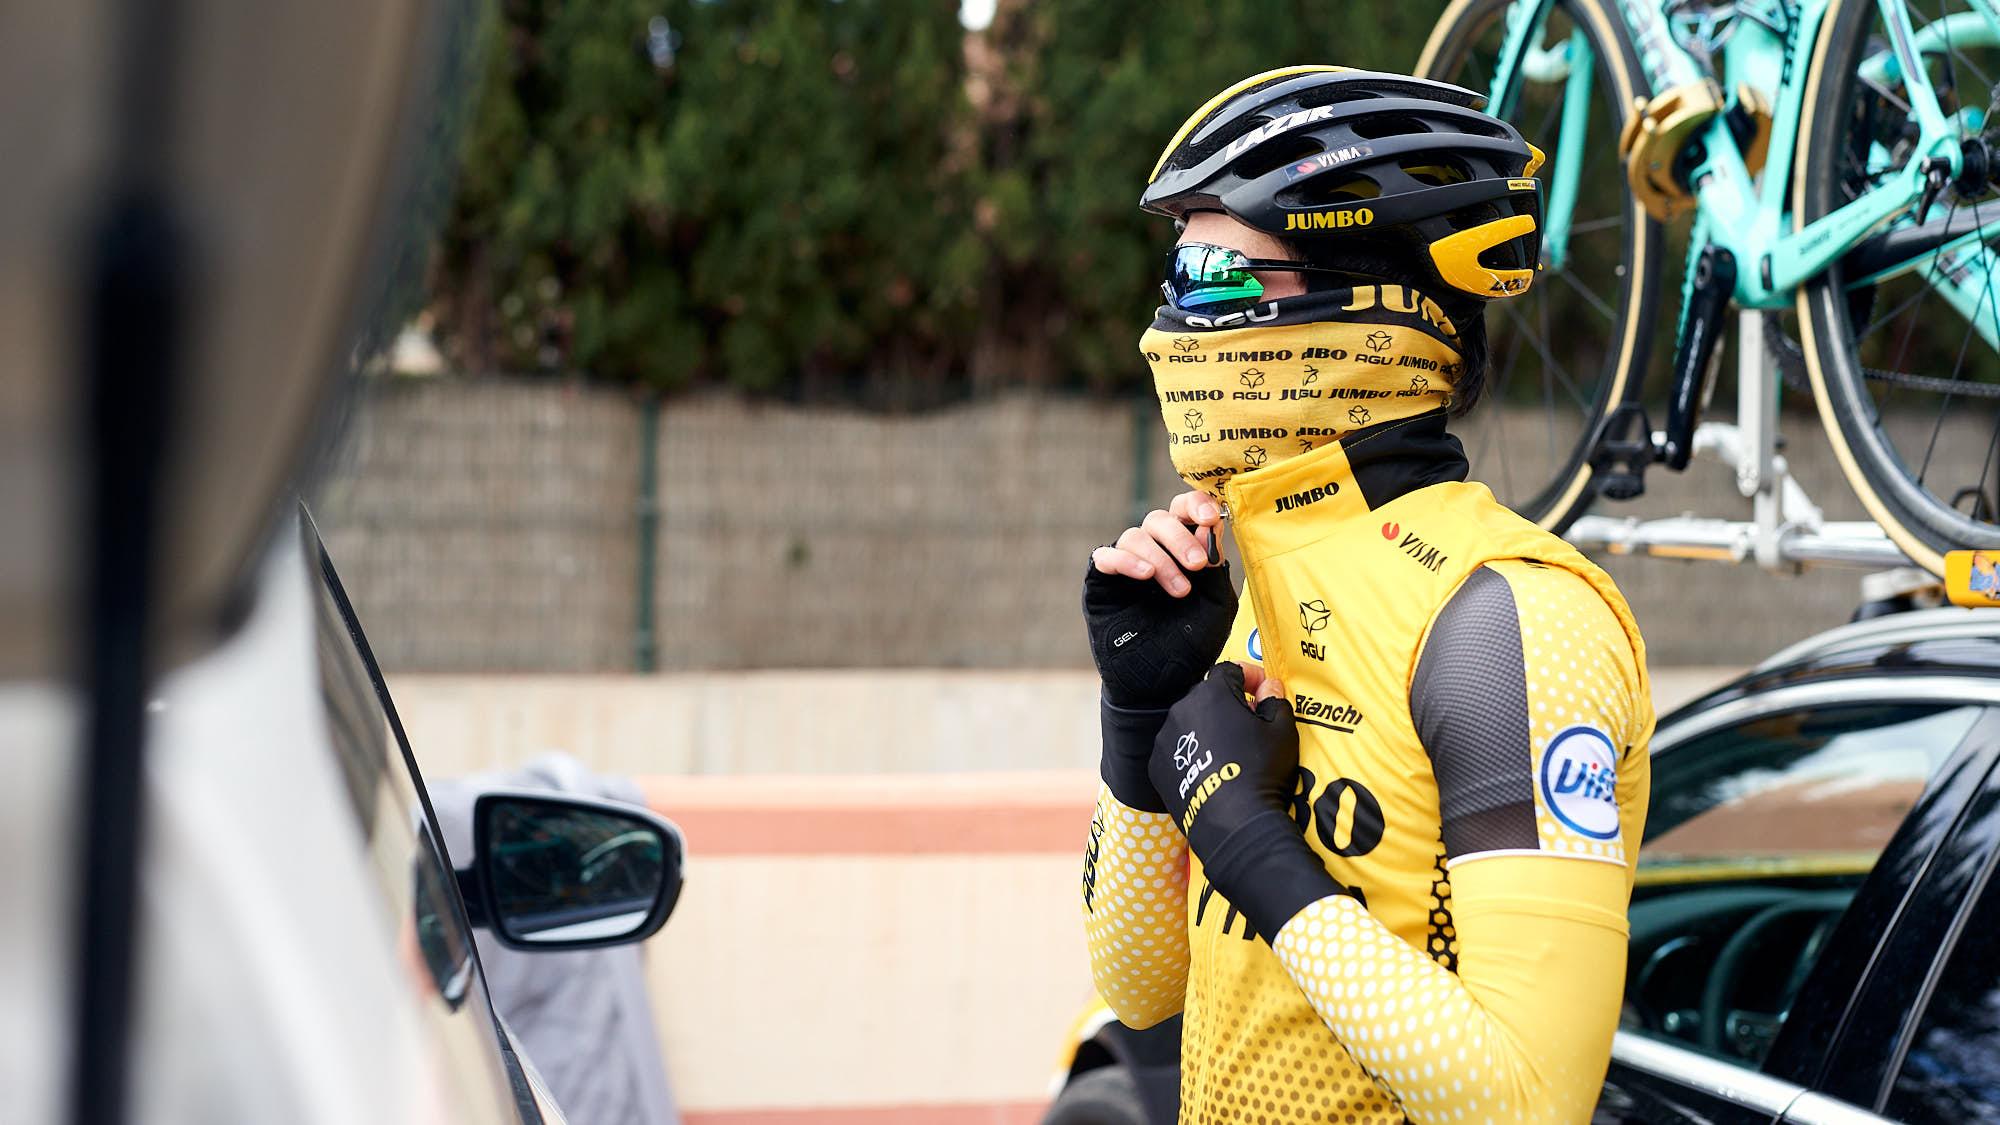 Jumbo-Visma cyclist Primoz Roglic getting dressed